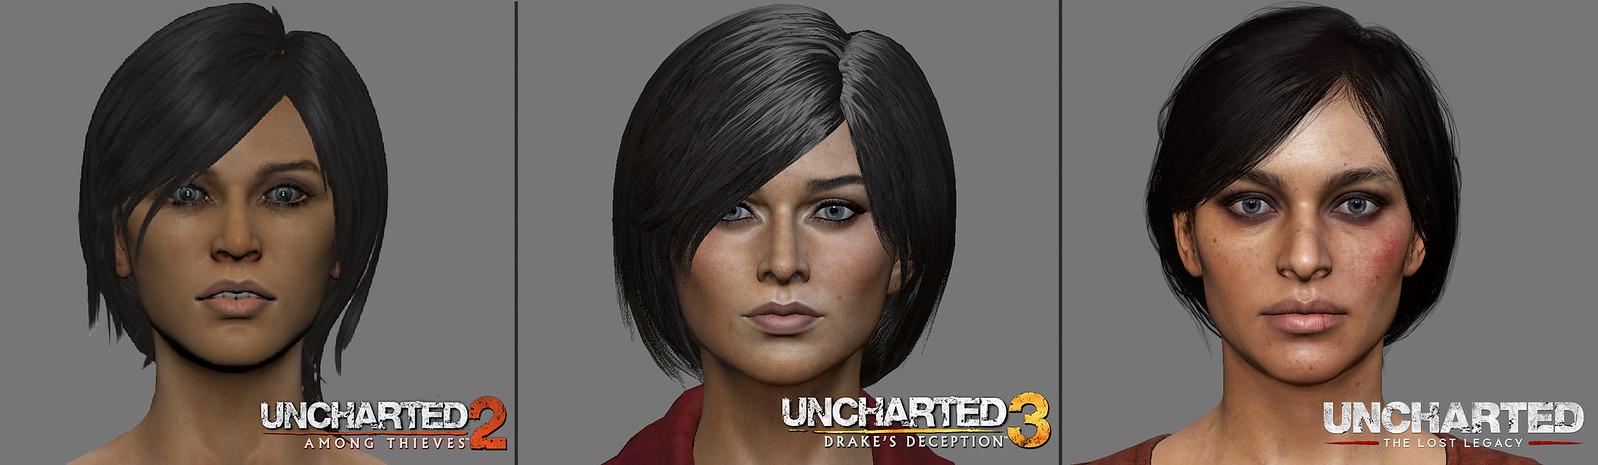 chloe_Game_Informer_comparison4